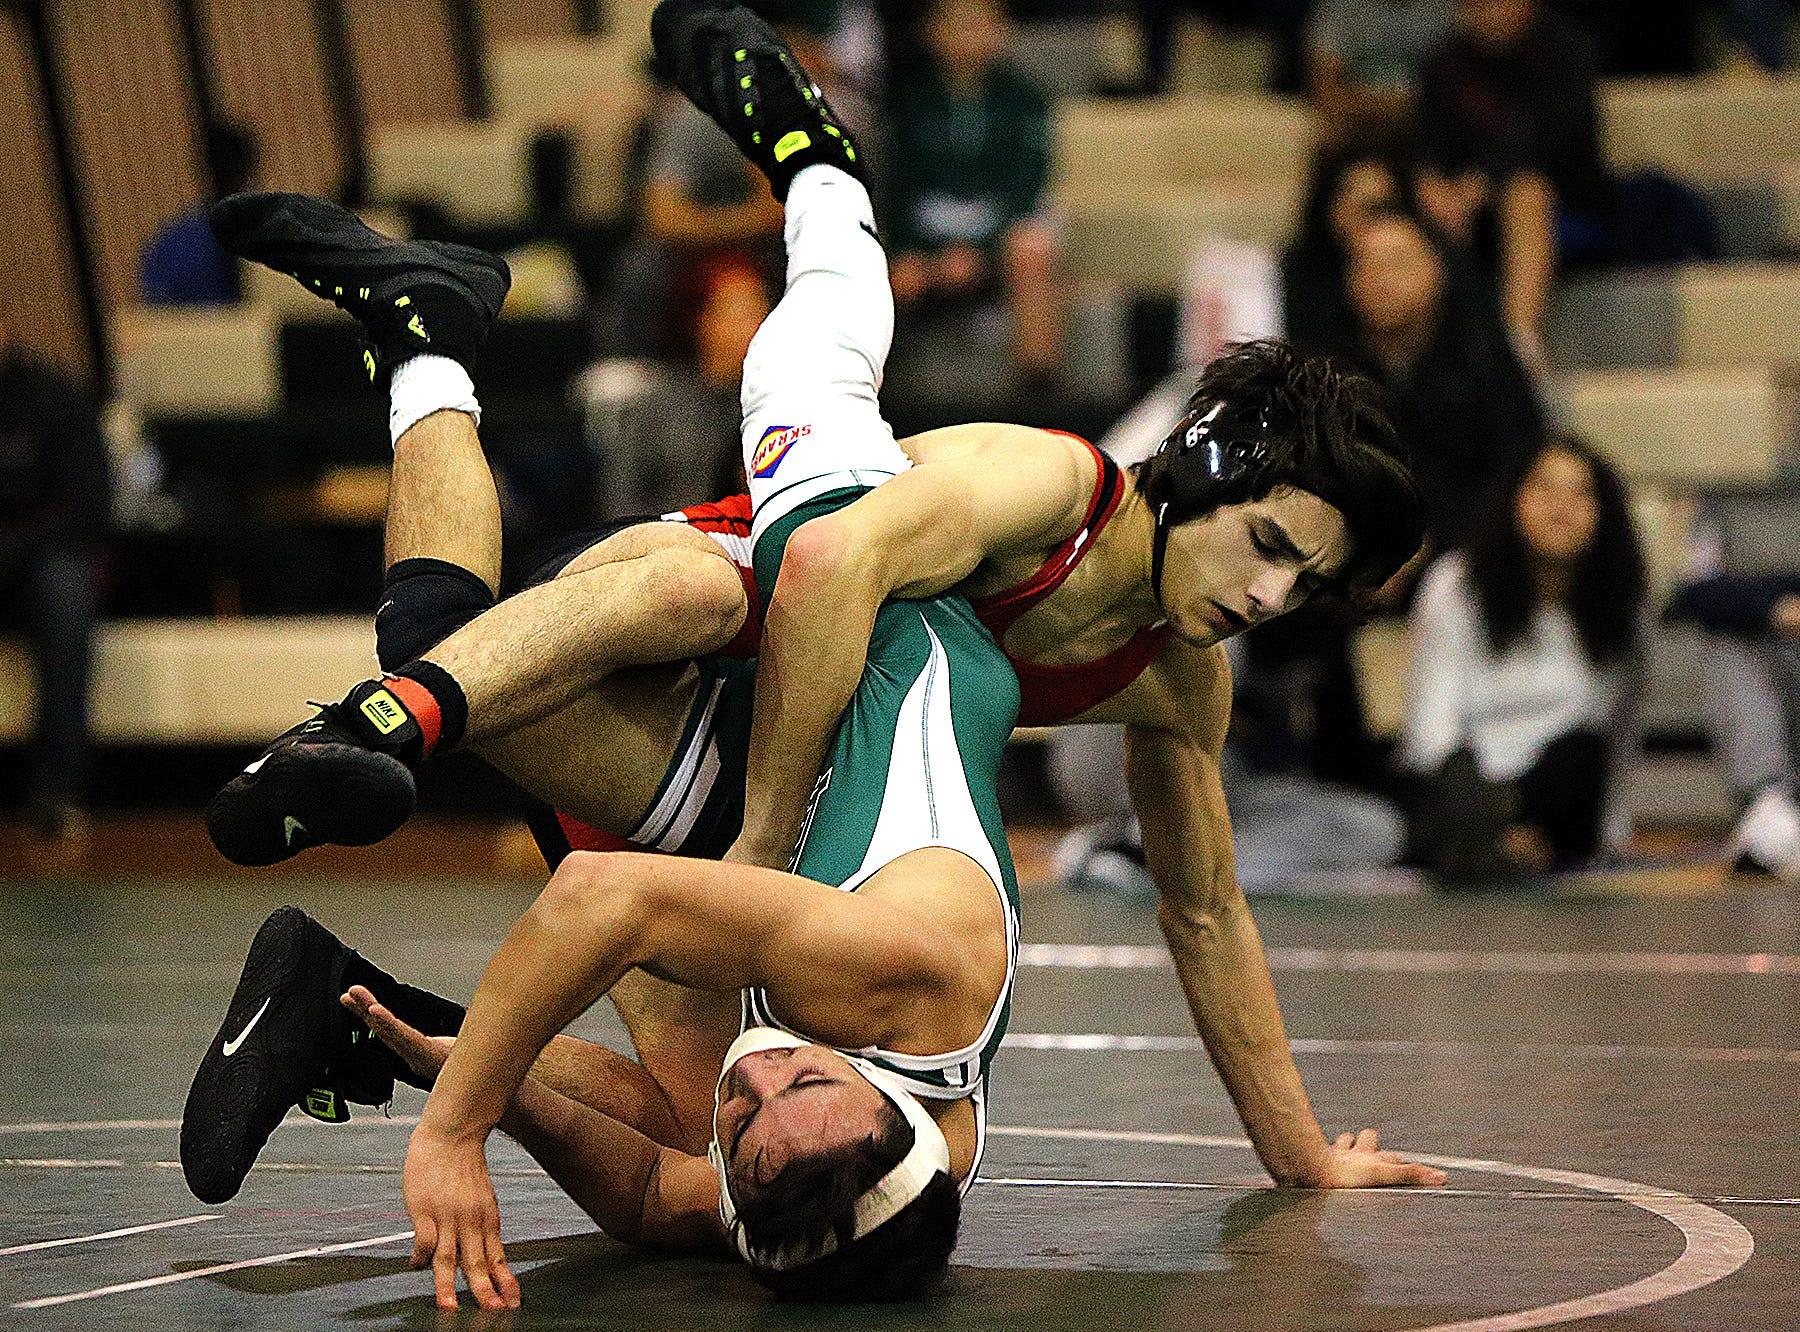 Bear Invitational wrestling tournament. 132lb Alexander Martinez (Bound Brook) top over Louis LaRocca (East Brunswick)